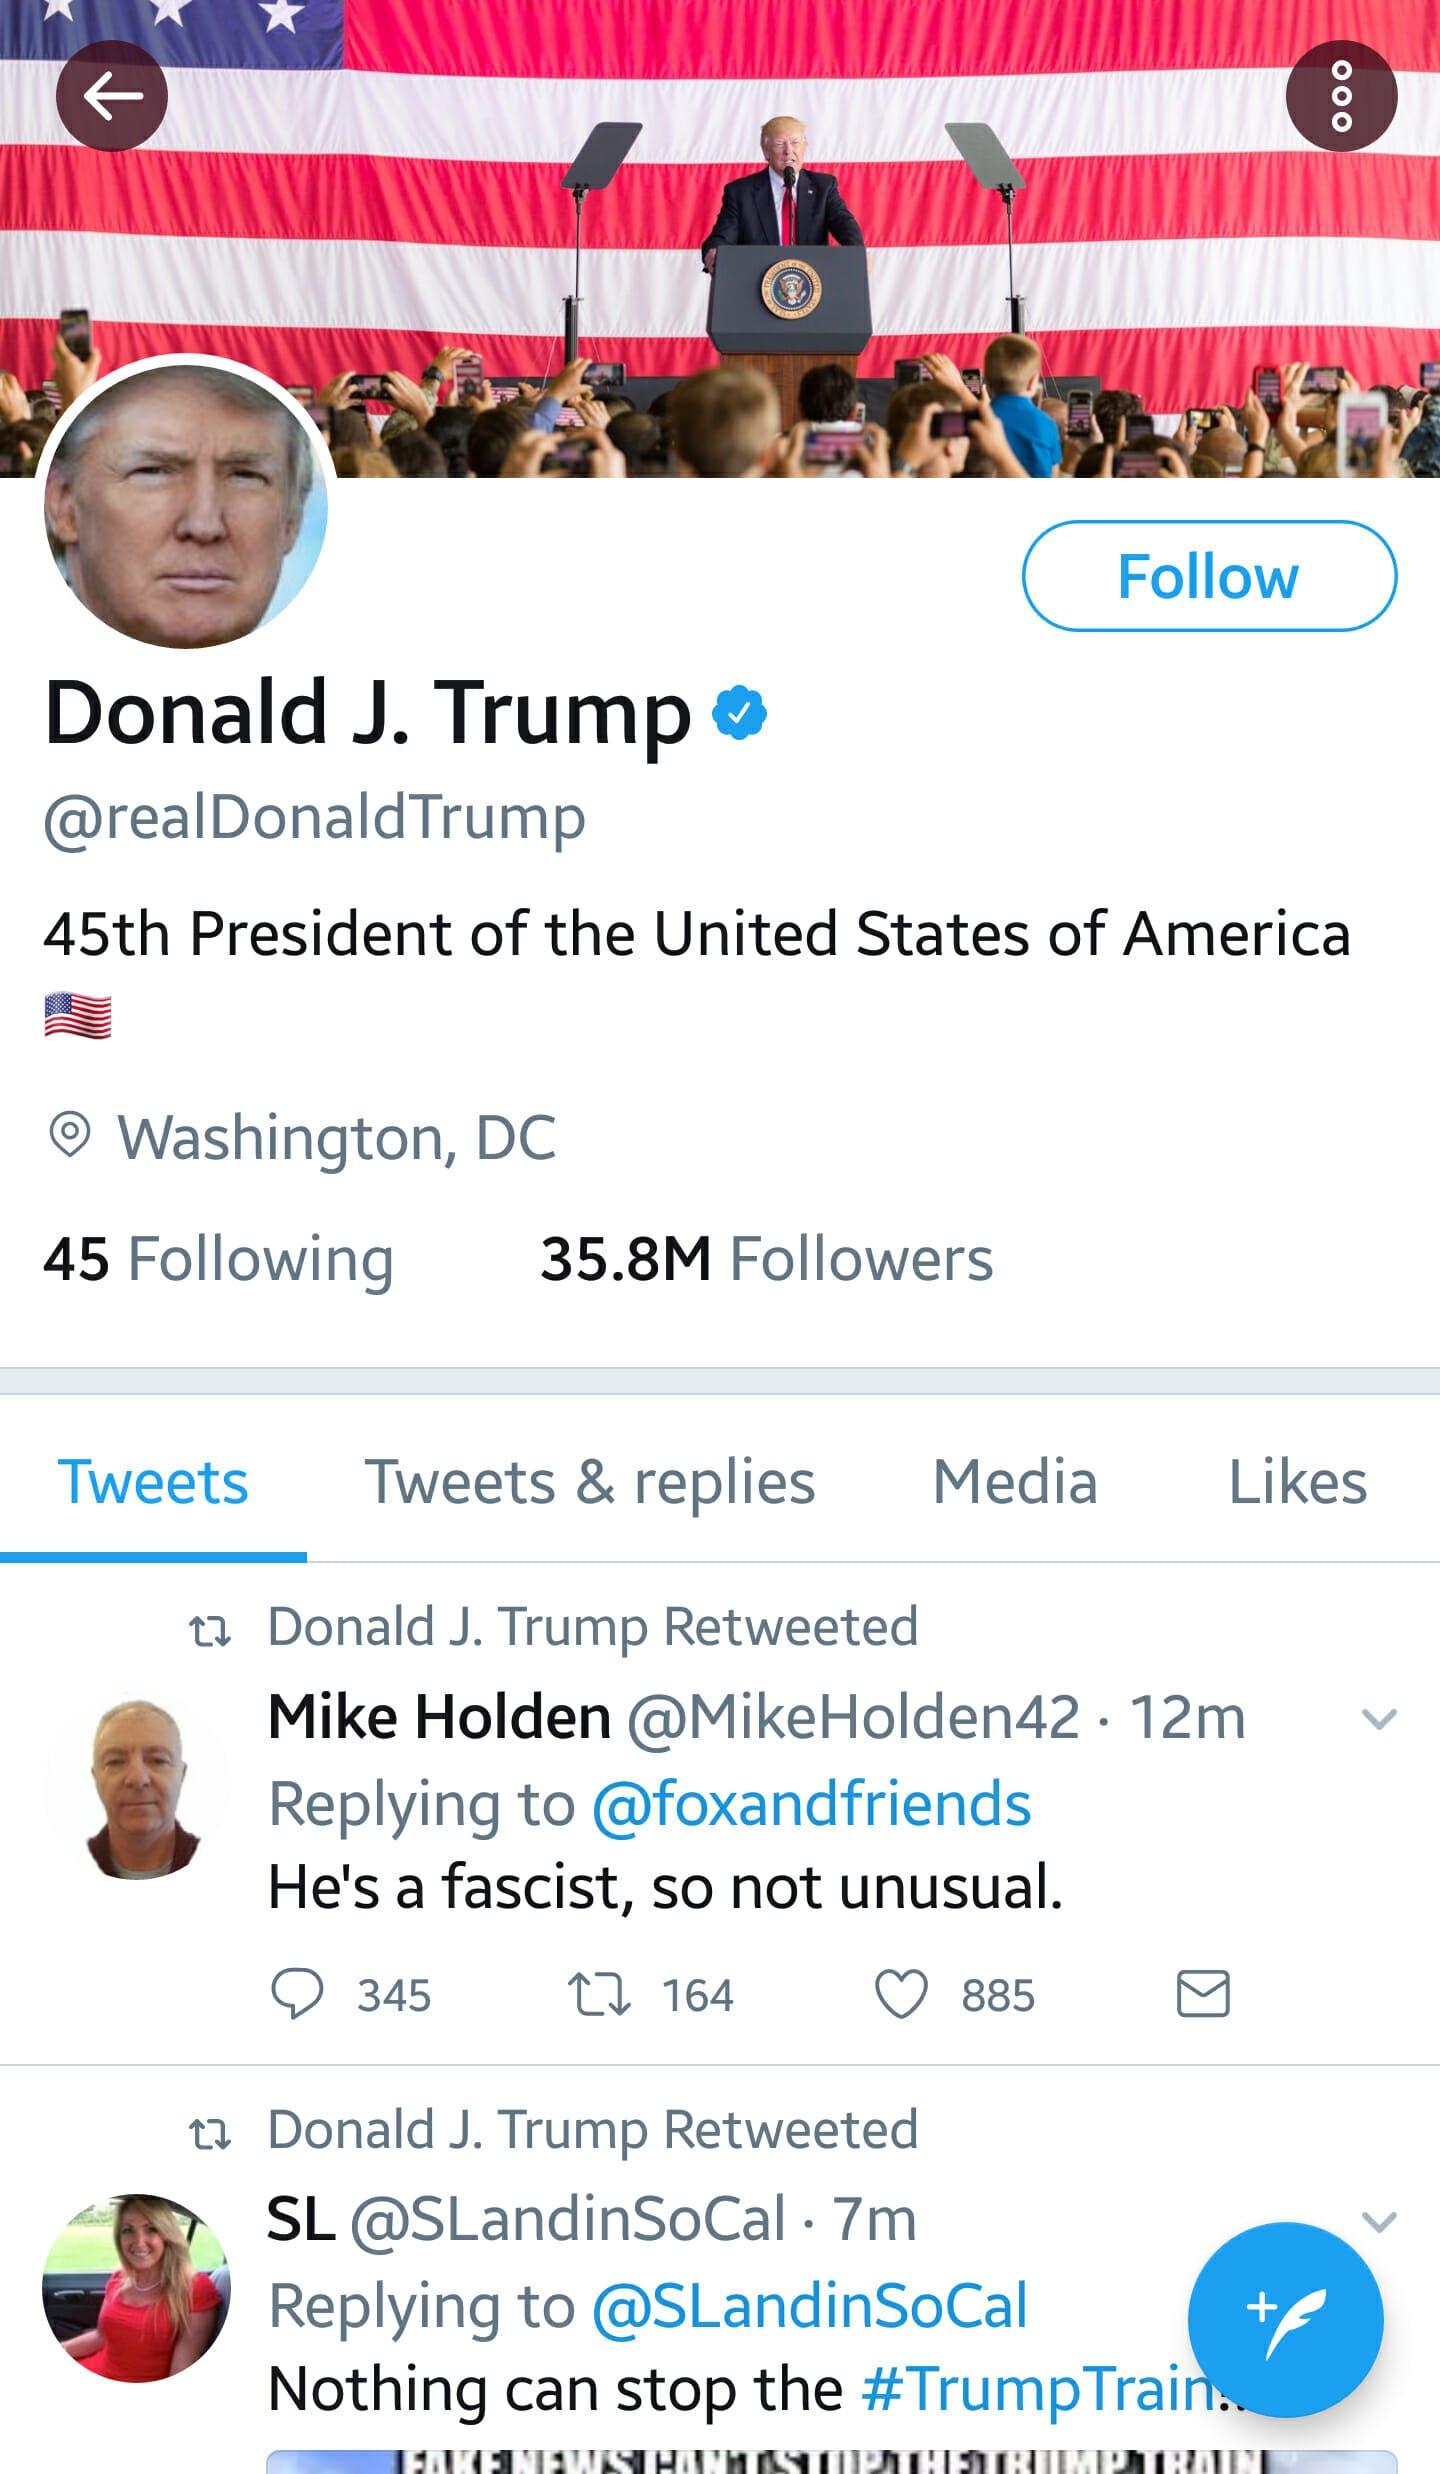 Donald Trump retweeted someone calling him a fascist.